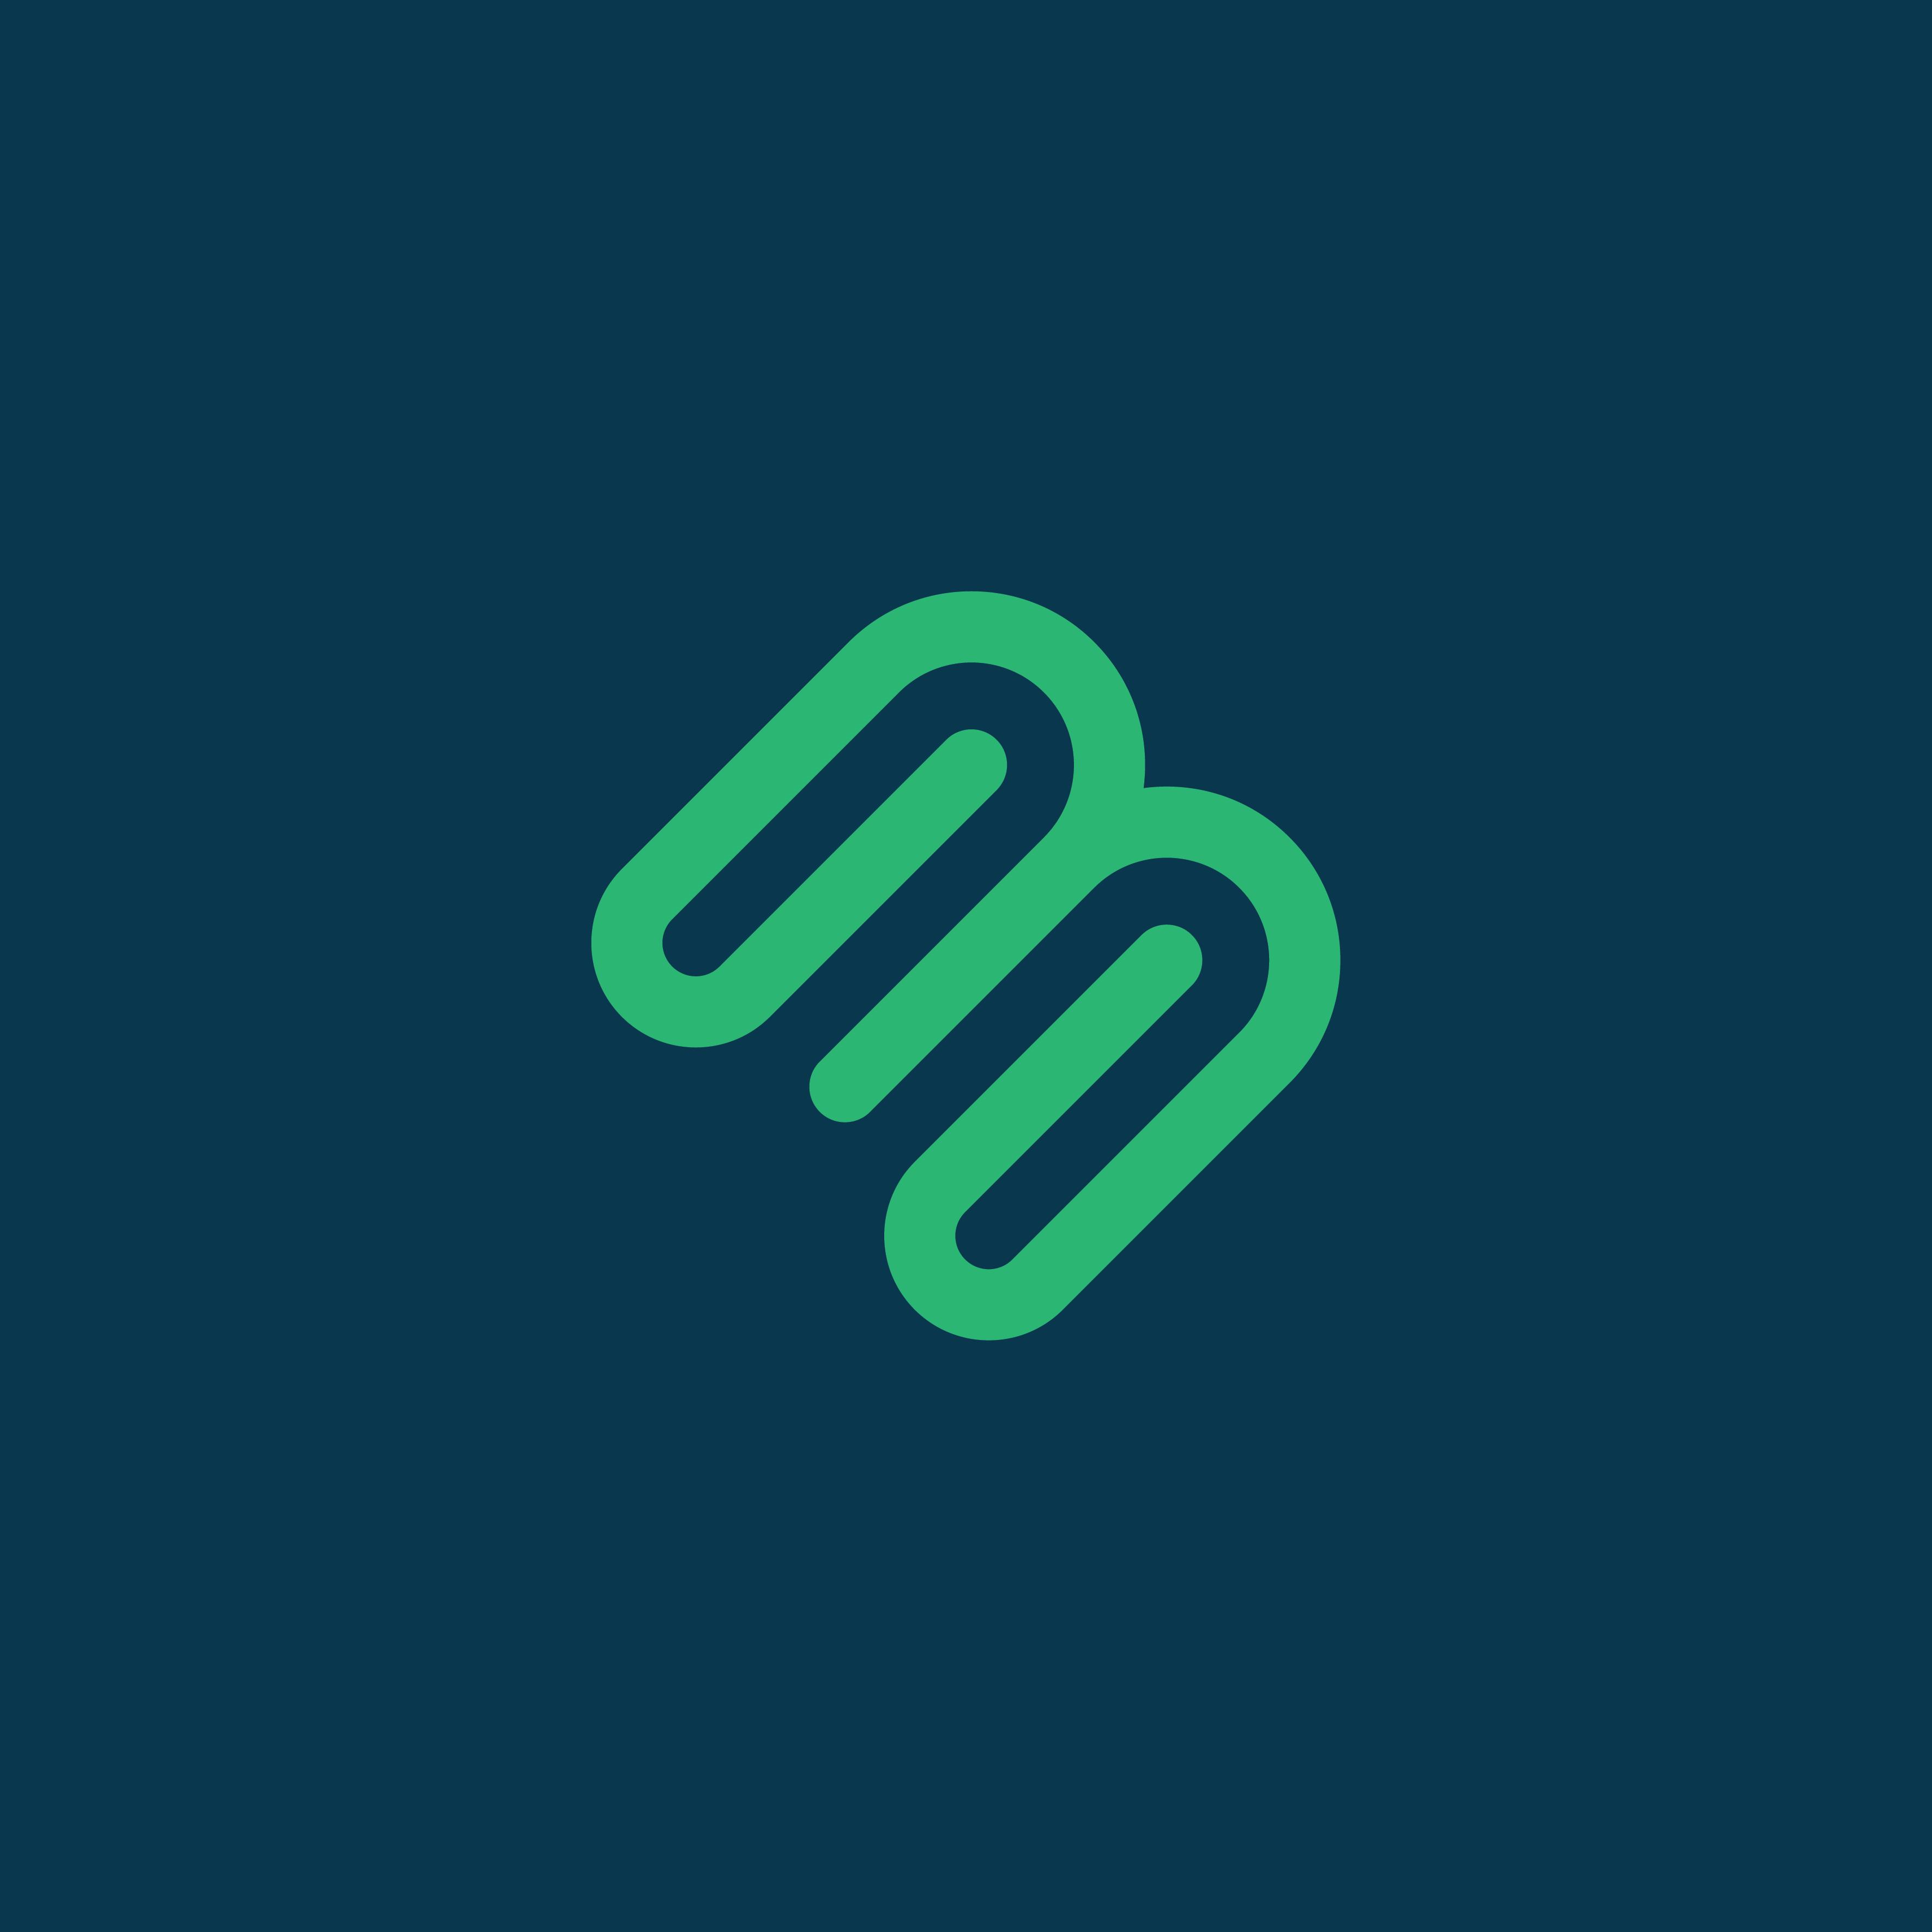 Creative Personal Logos Bm Logo Monogram Logo Design Bm Logo Logo Concept Music Logo Design Monogram Logo Design Bm Logo